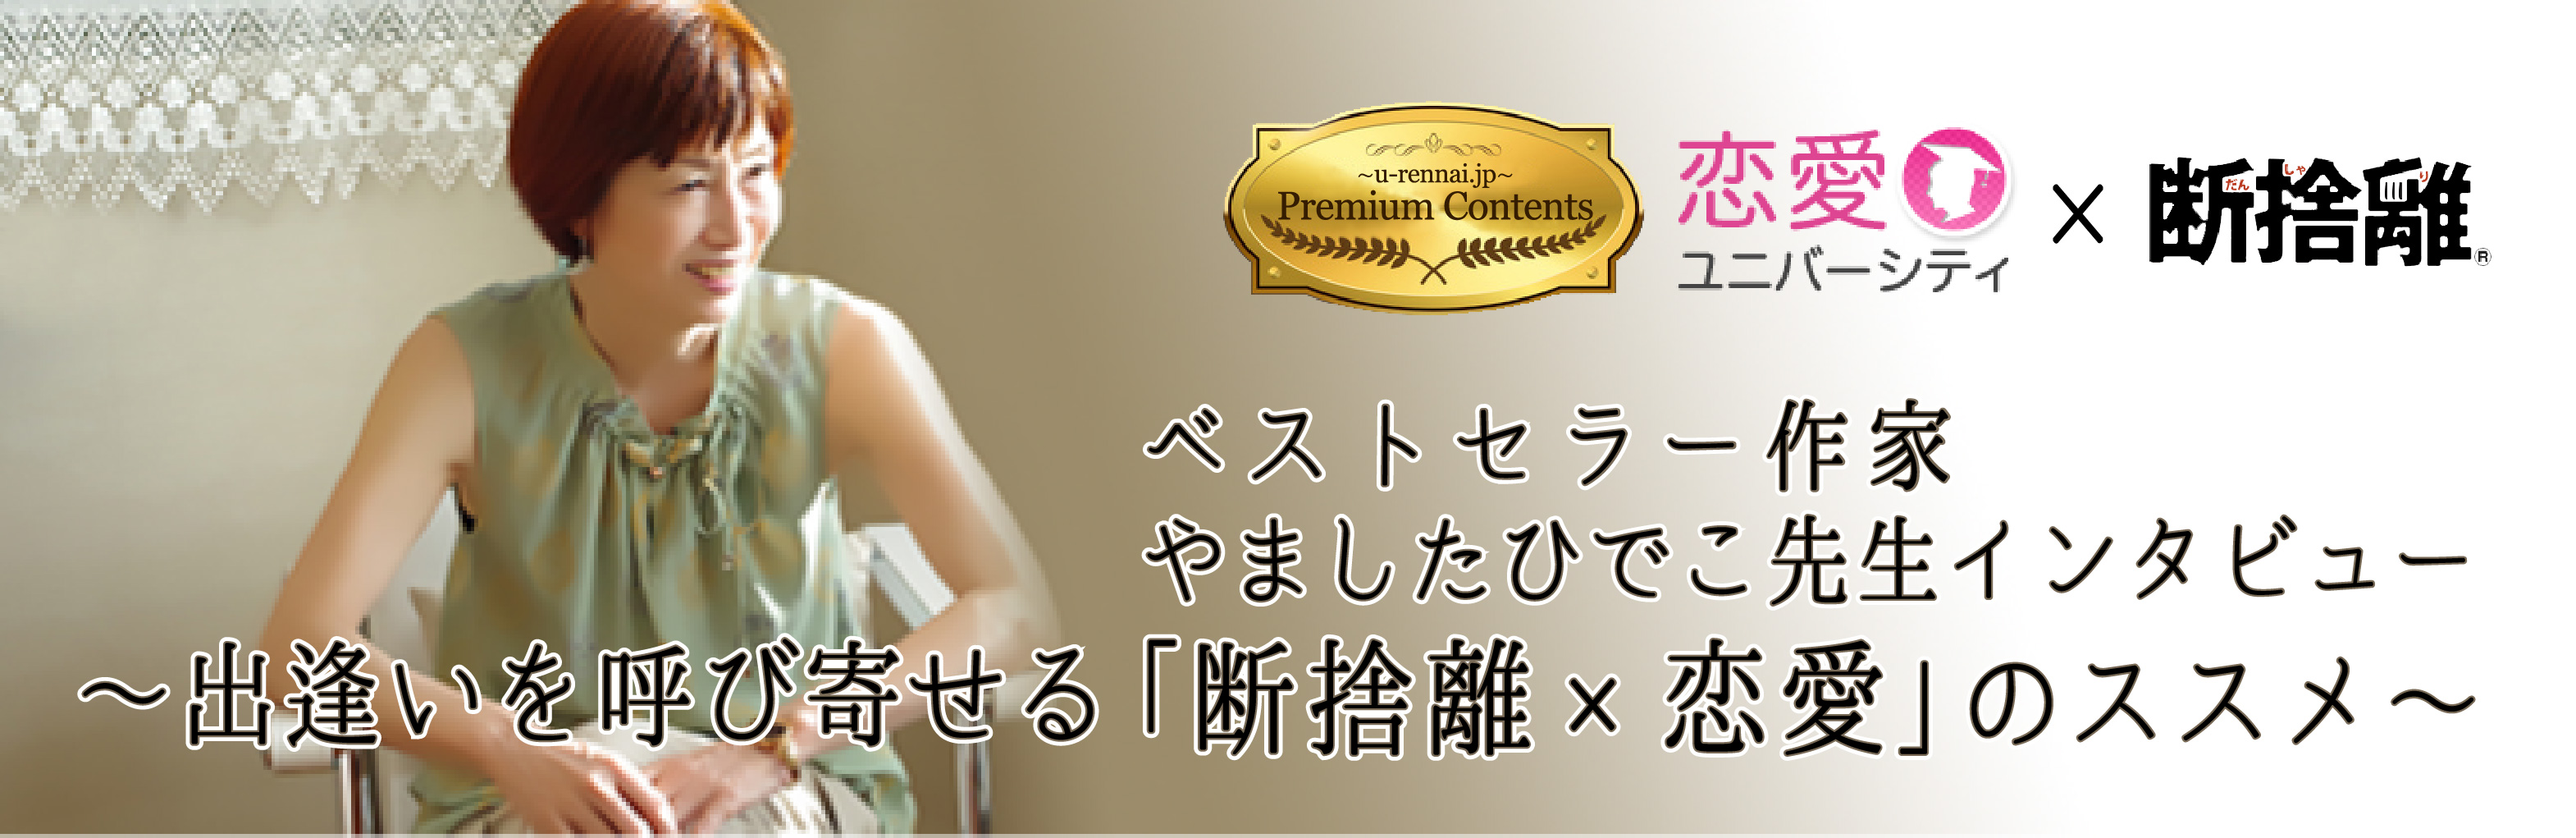 Premium Contents『断捨離x恋愛』やましたひでこ先生インタビューVol.1